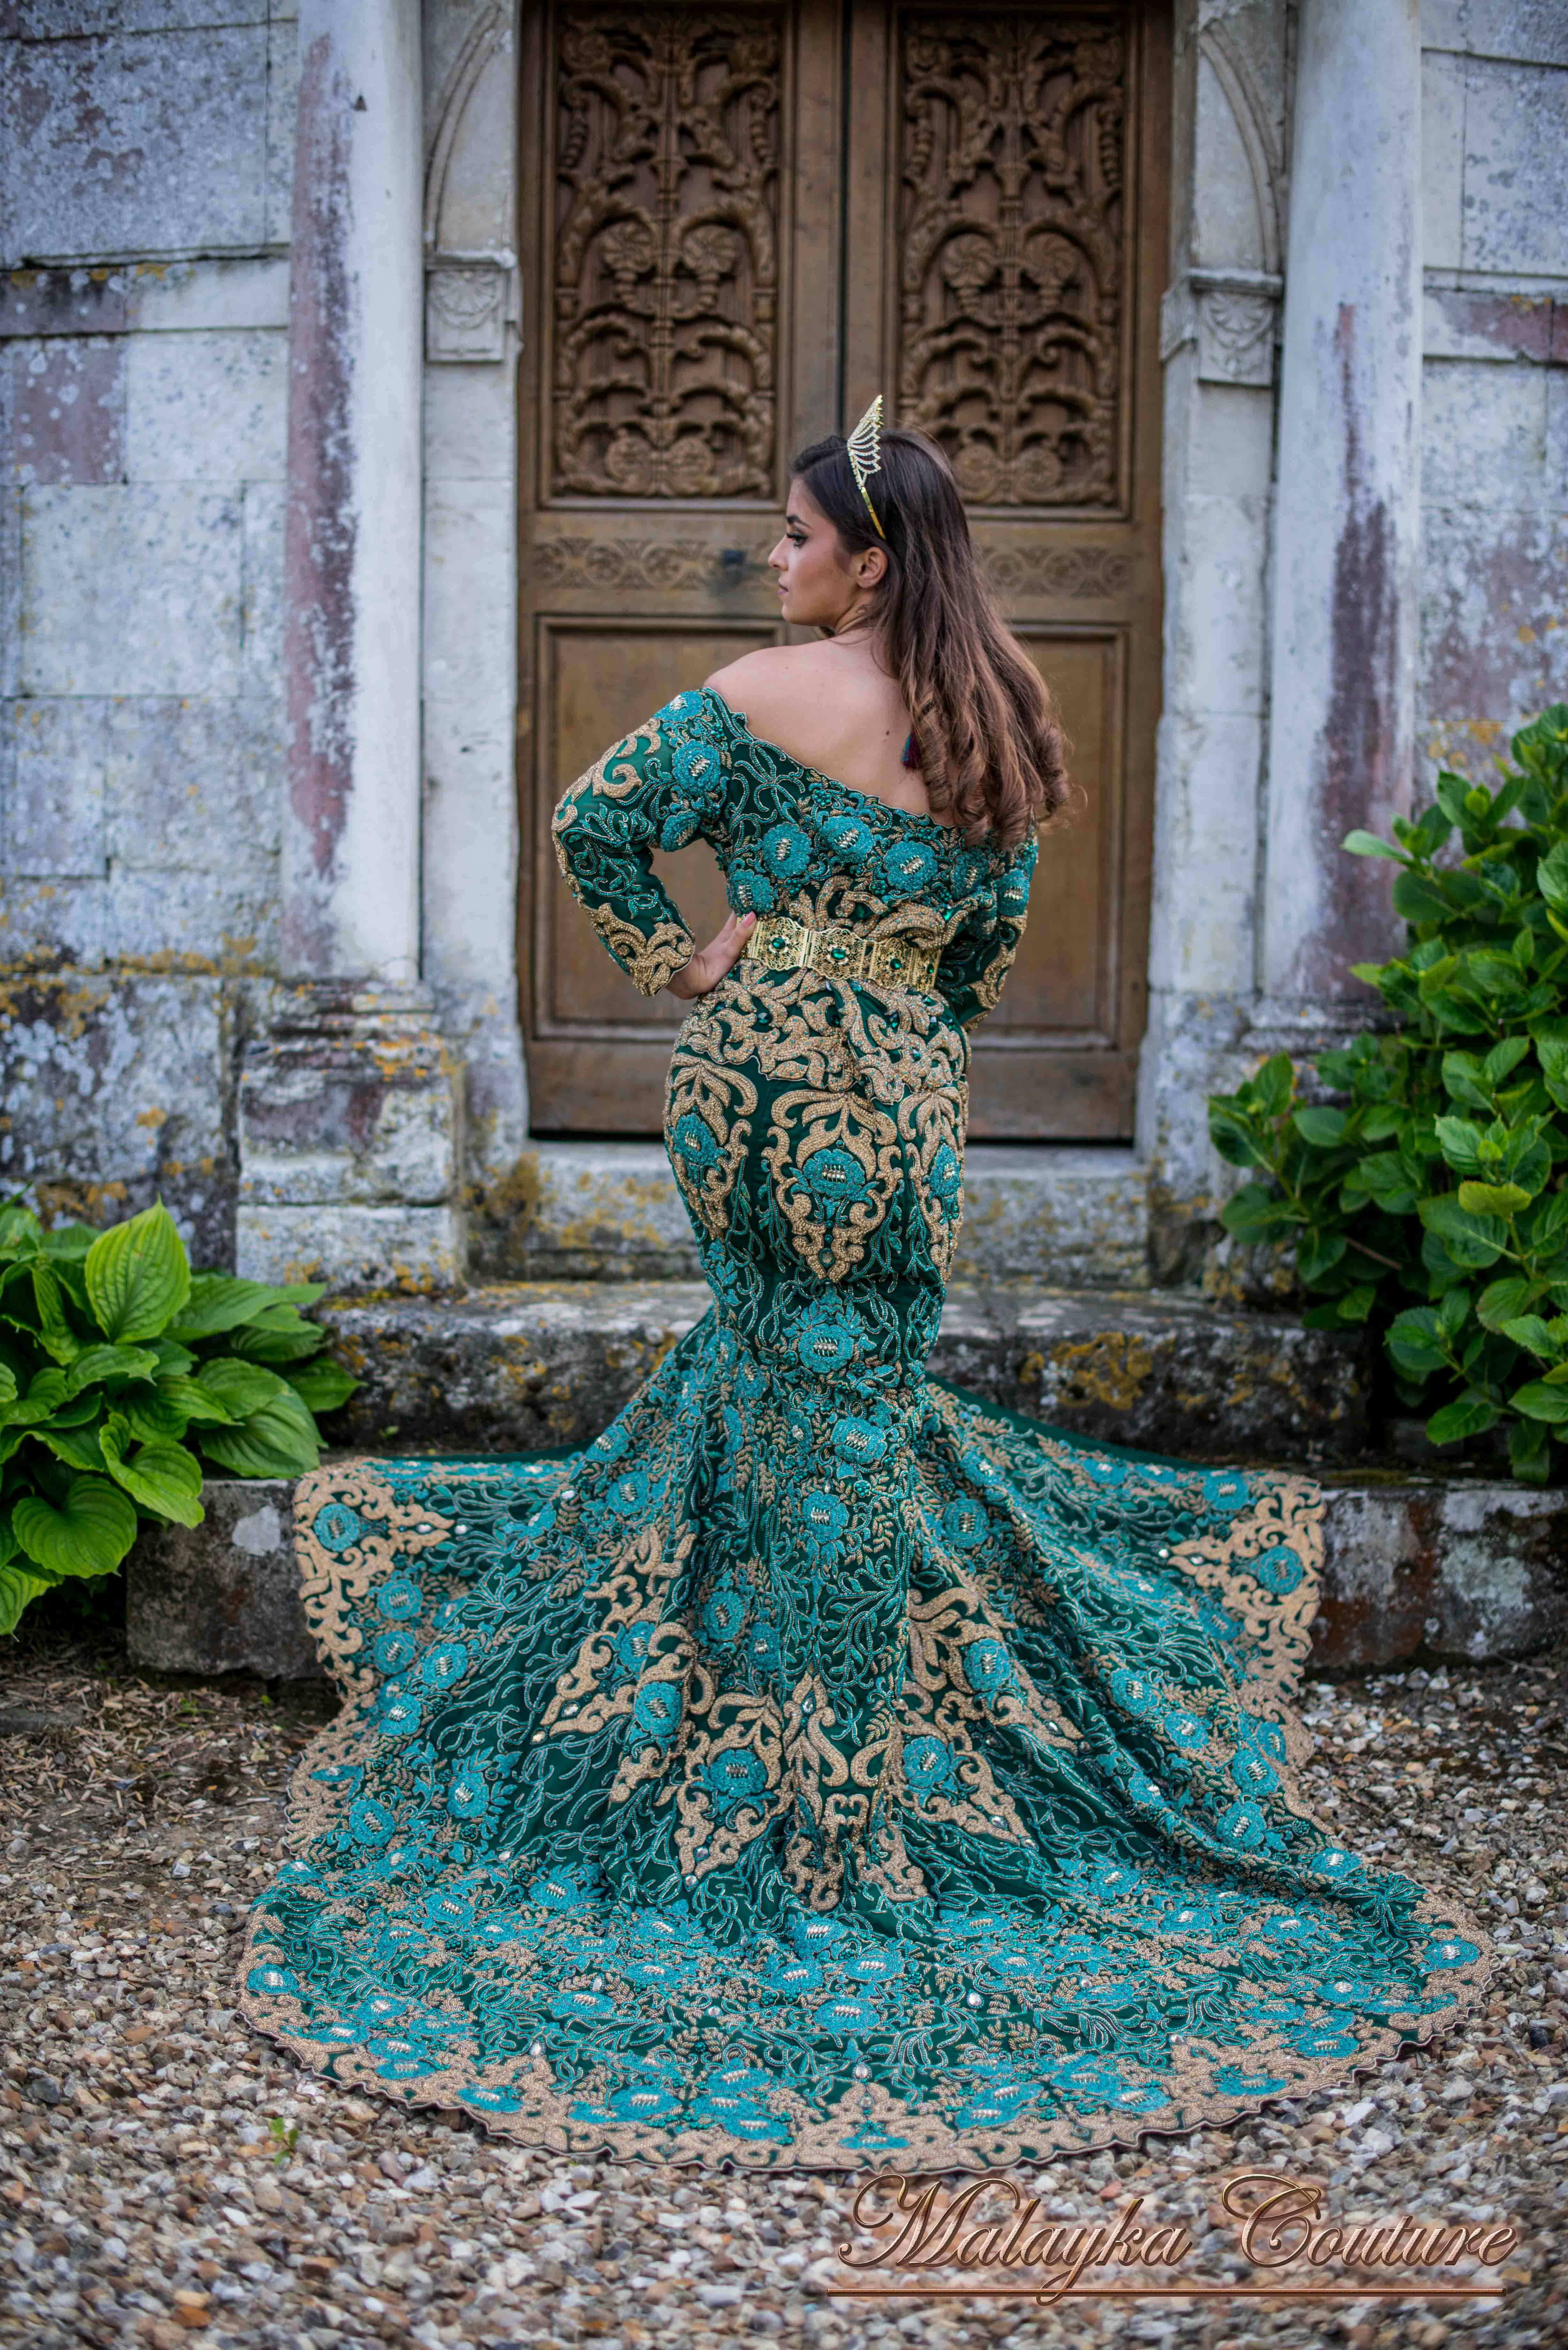 malayka couture